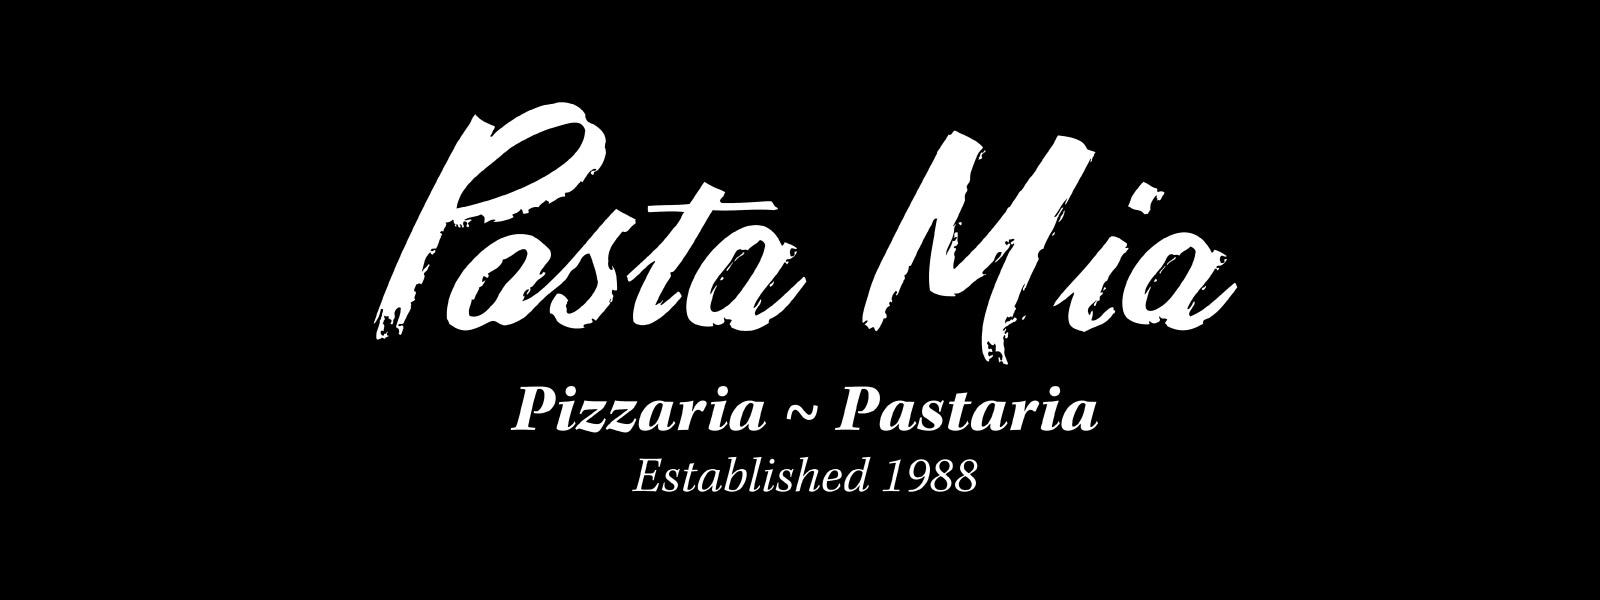 Pasta-Mia-header